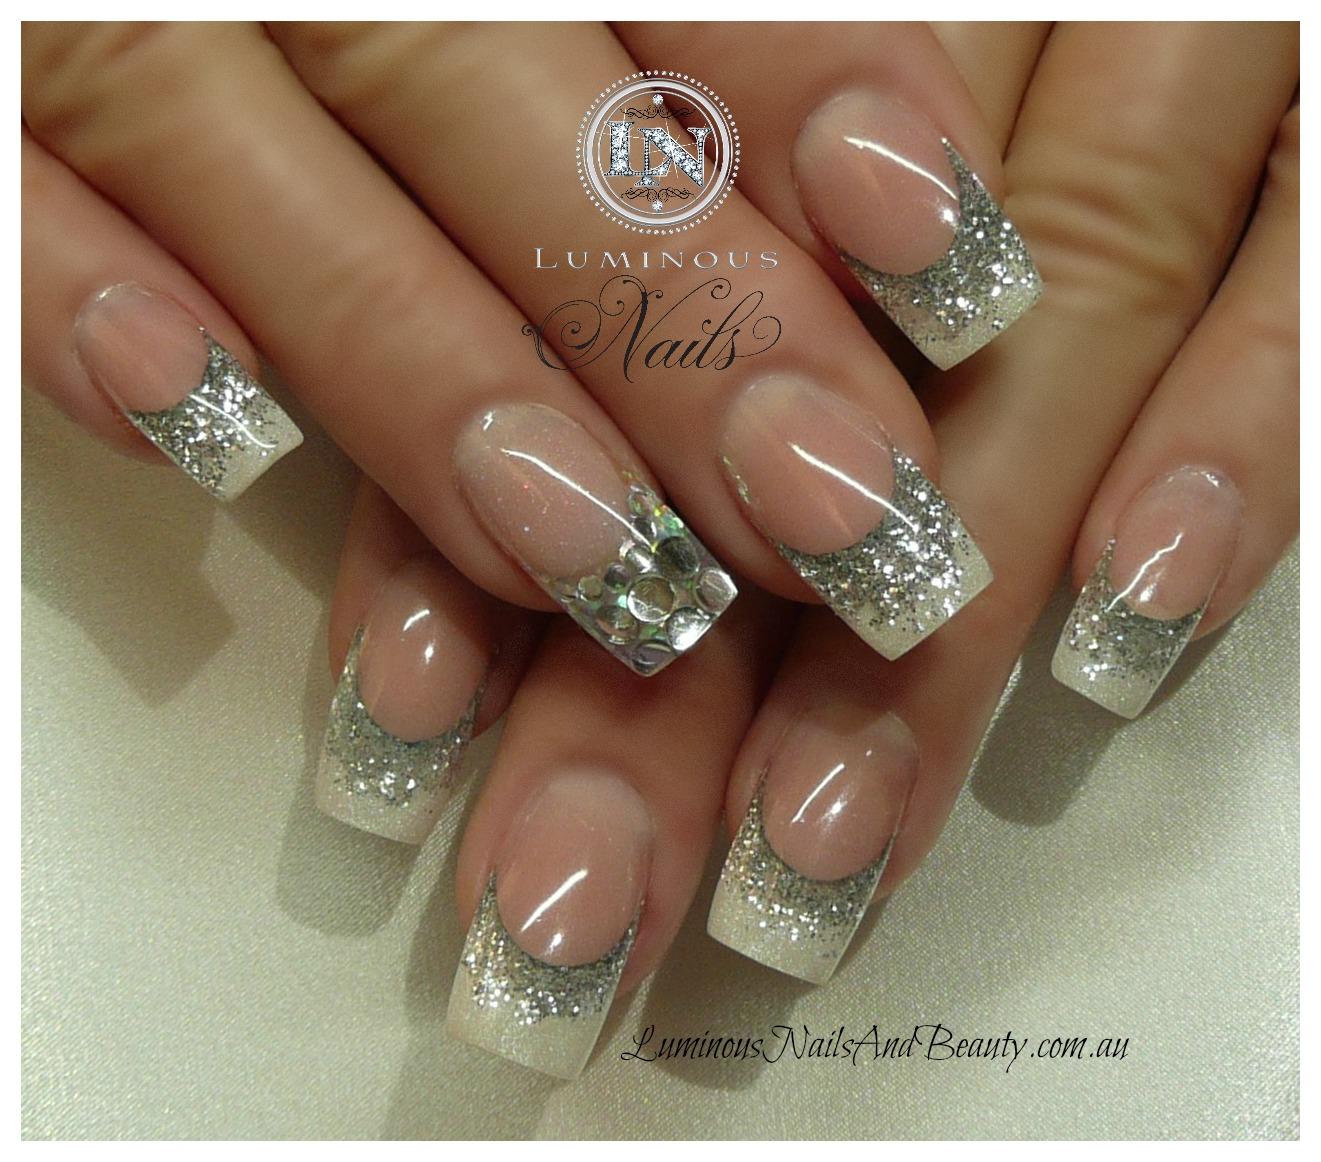 Luminous Nails: September 2012